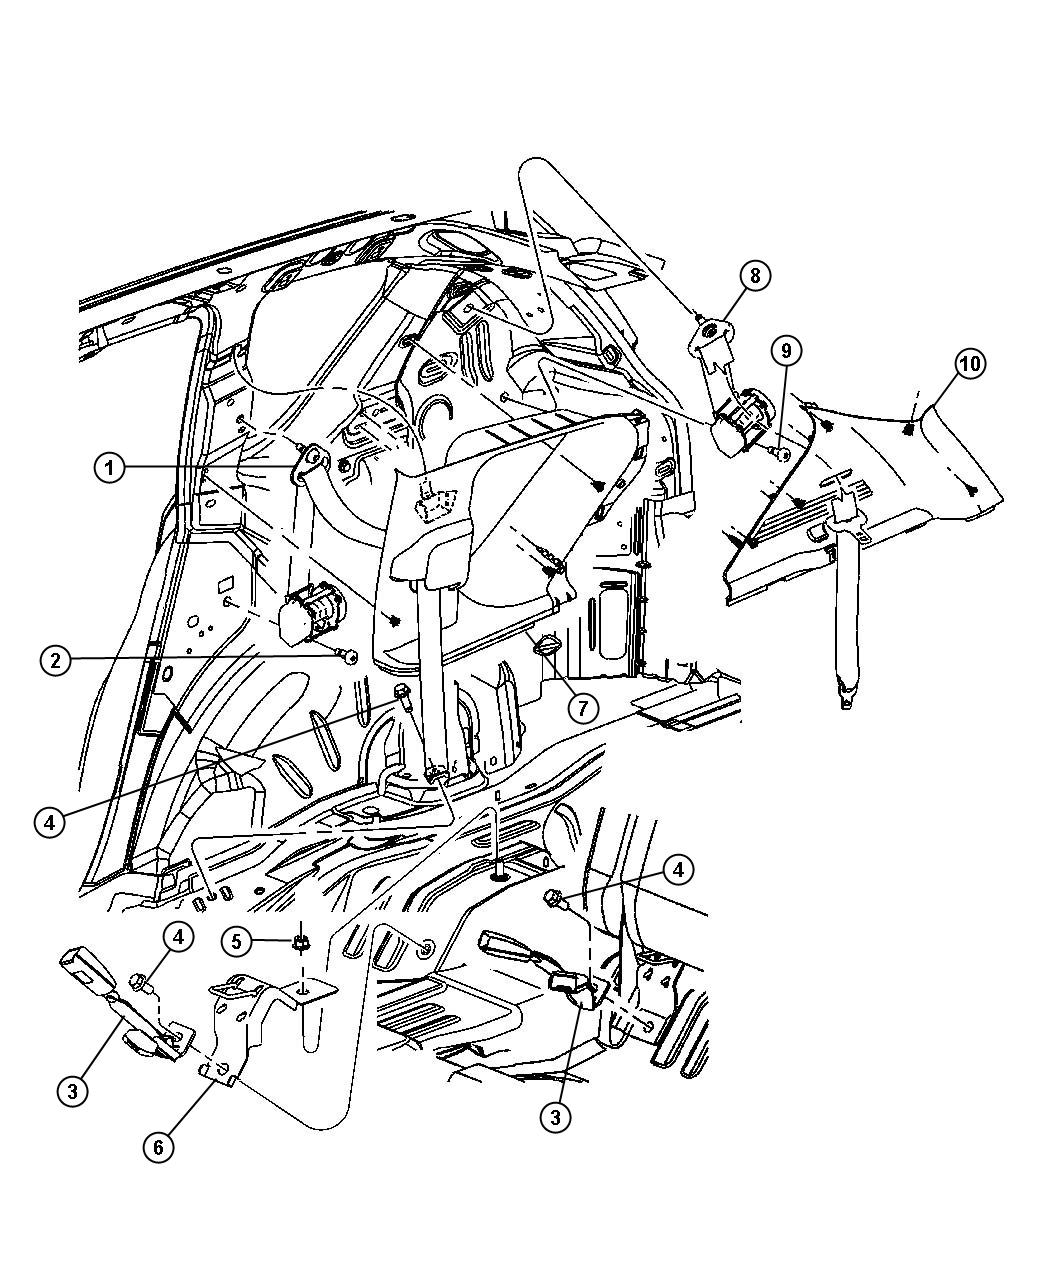 tags: #jeep wrangler 4 0 belt diagram#98 jeep wrangler belt diagram#95 jeep  wrangler belt diagram#jeep wrangler ac problems#1999 jeep wrangler belt